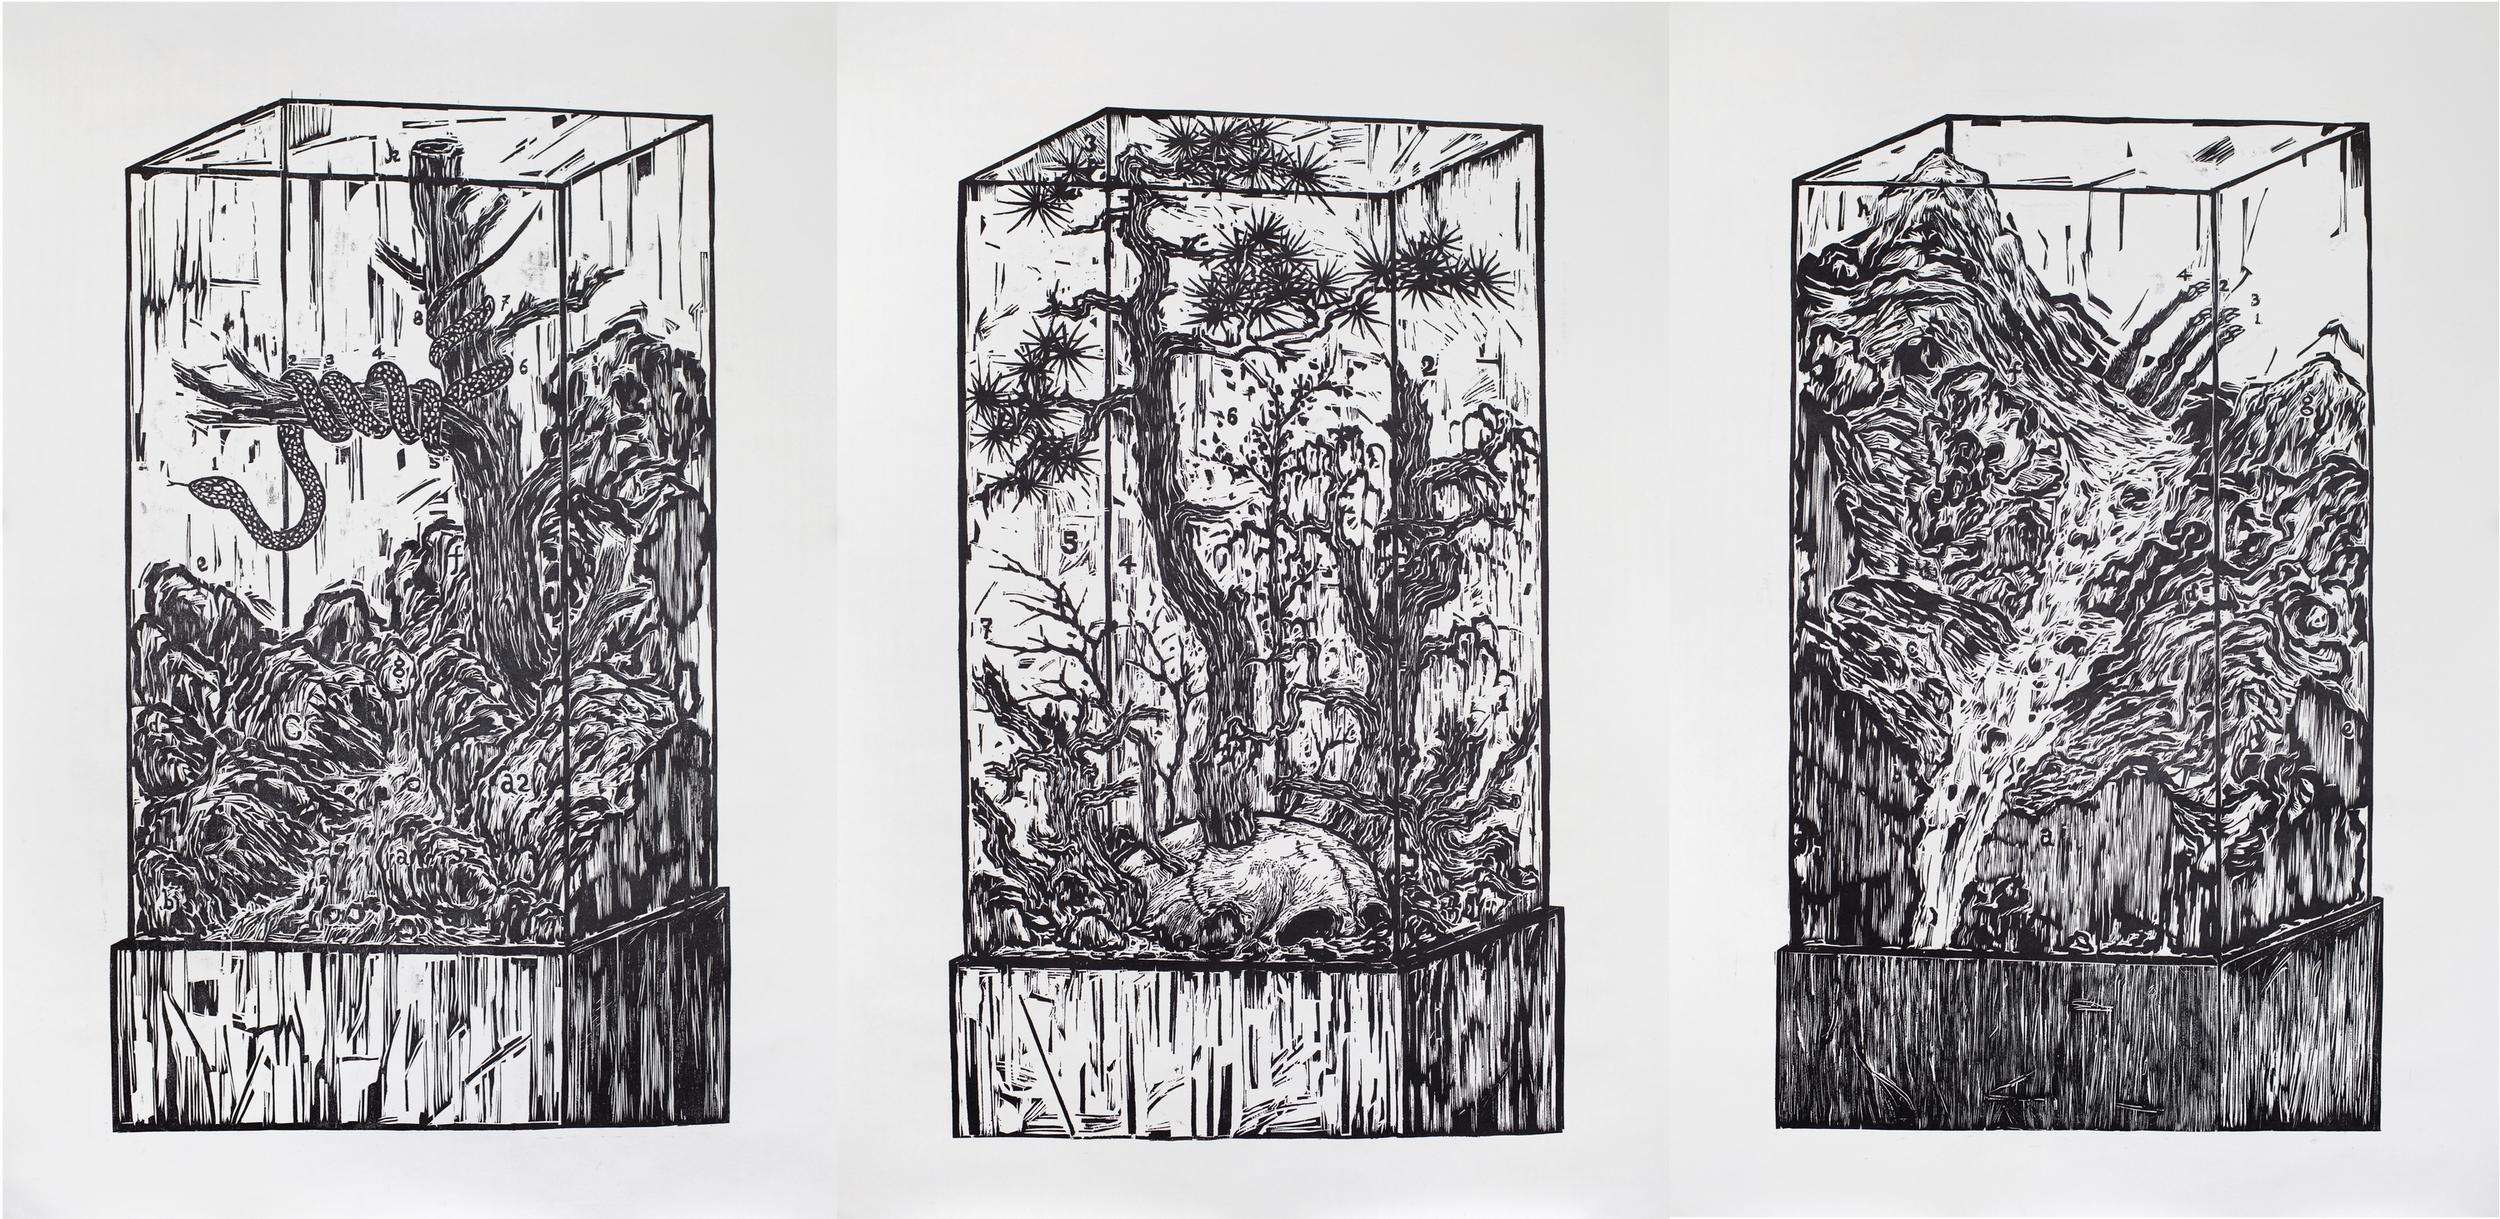 Ni Youyu 倪有鱼, Specimen Cabinet (Triptych) 标本柜 (3联幅), 2011, Woodcut print on paper 纸本黑白木刻, 105 x 72 cm x 3